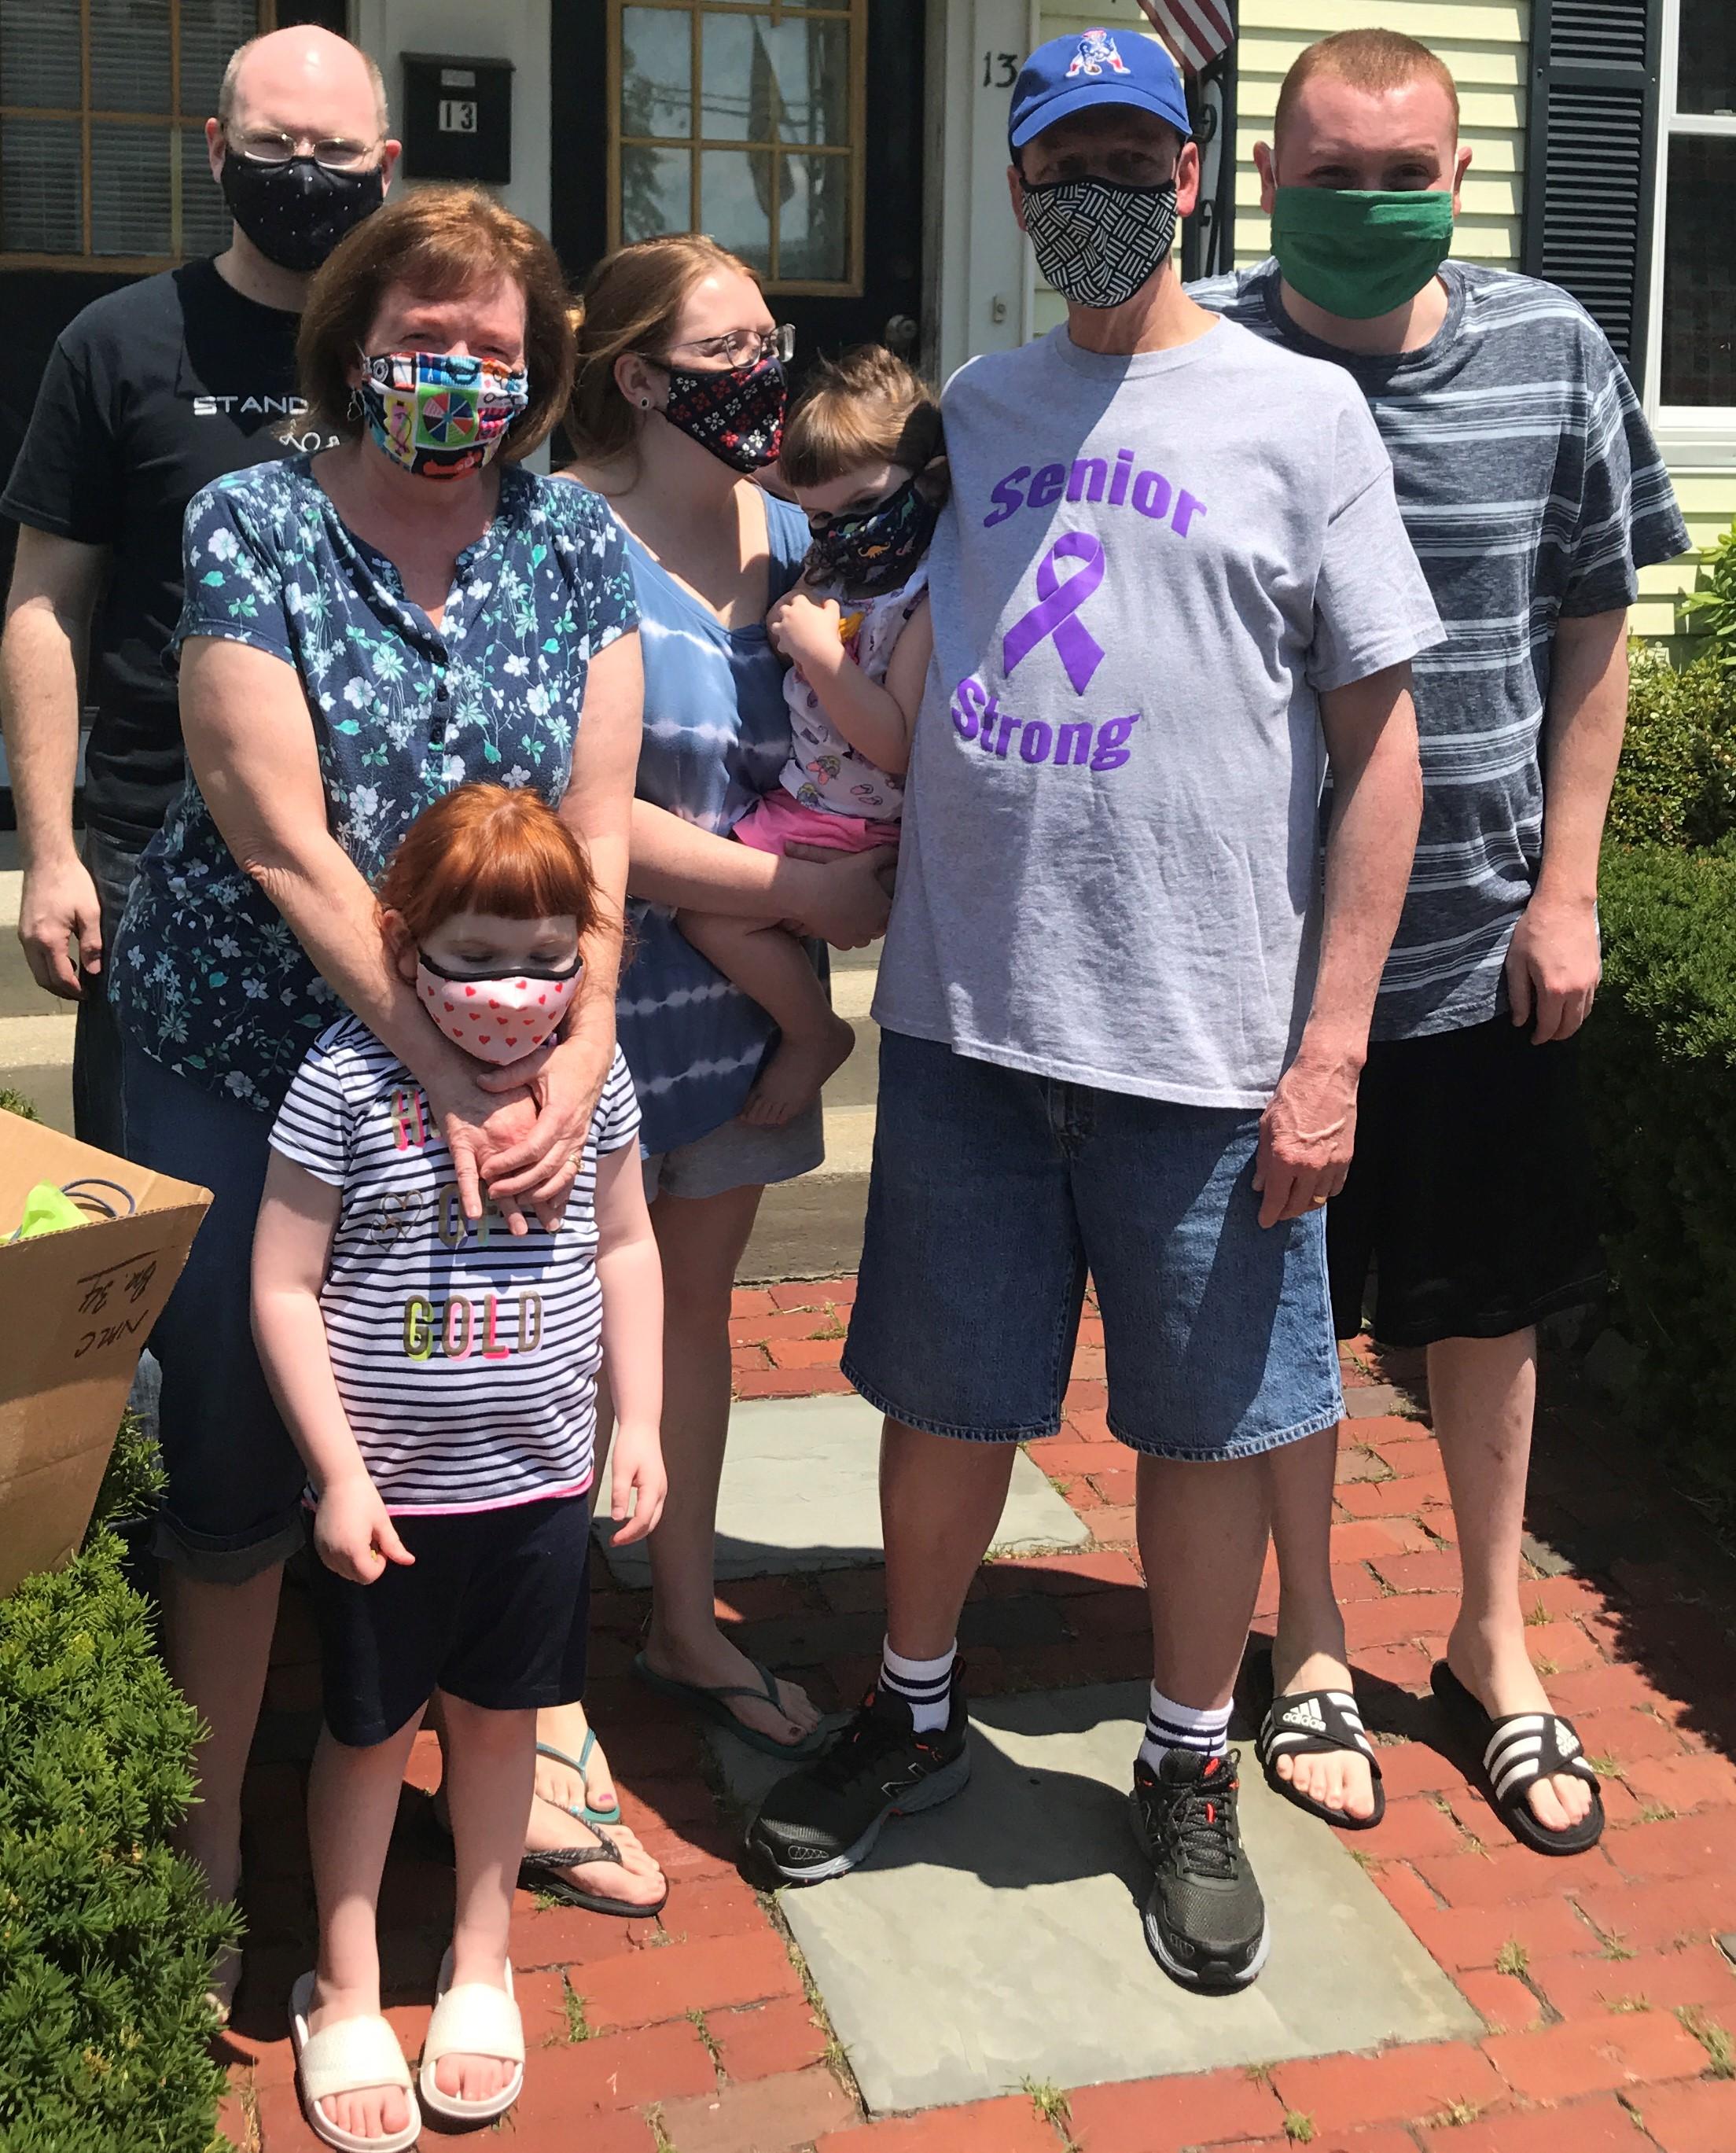 Paul-Seniors-Family-helps-celebrate